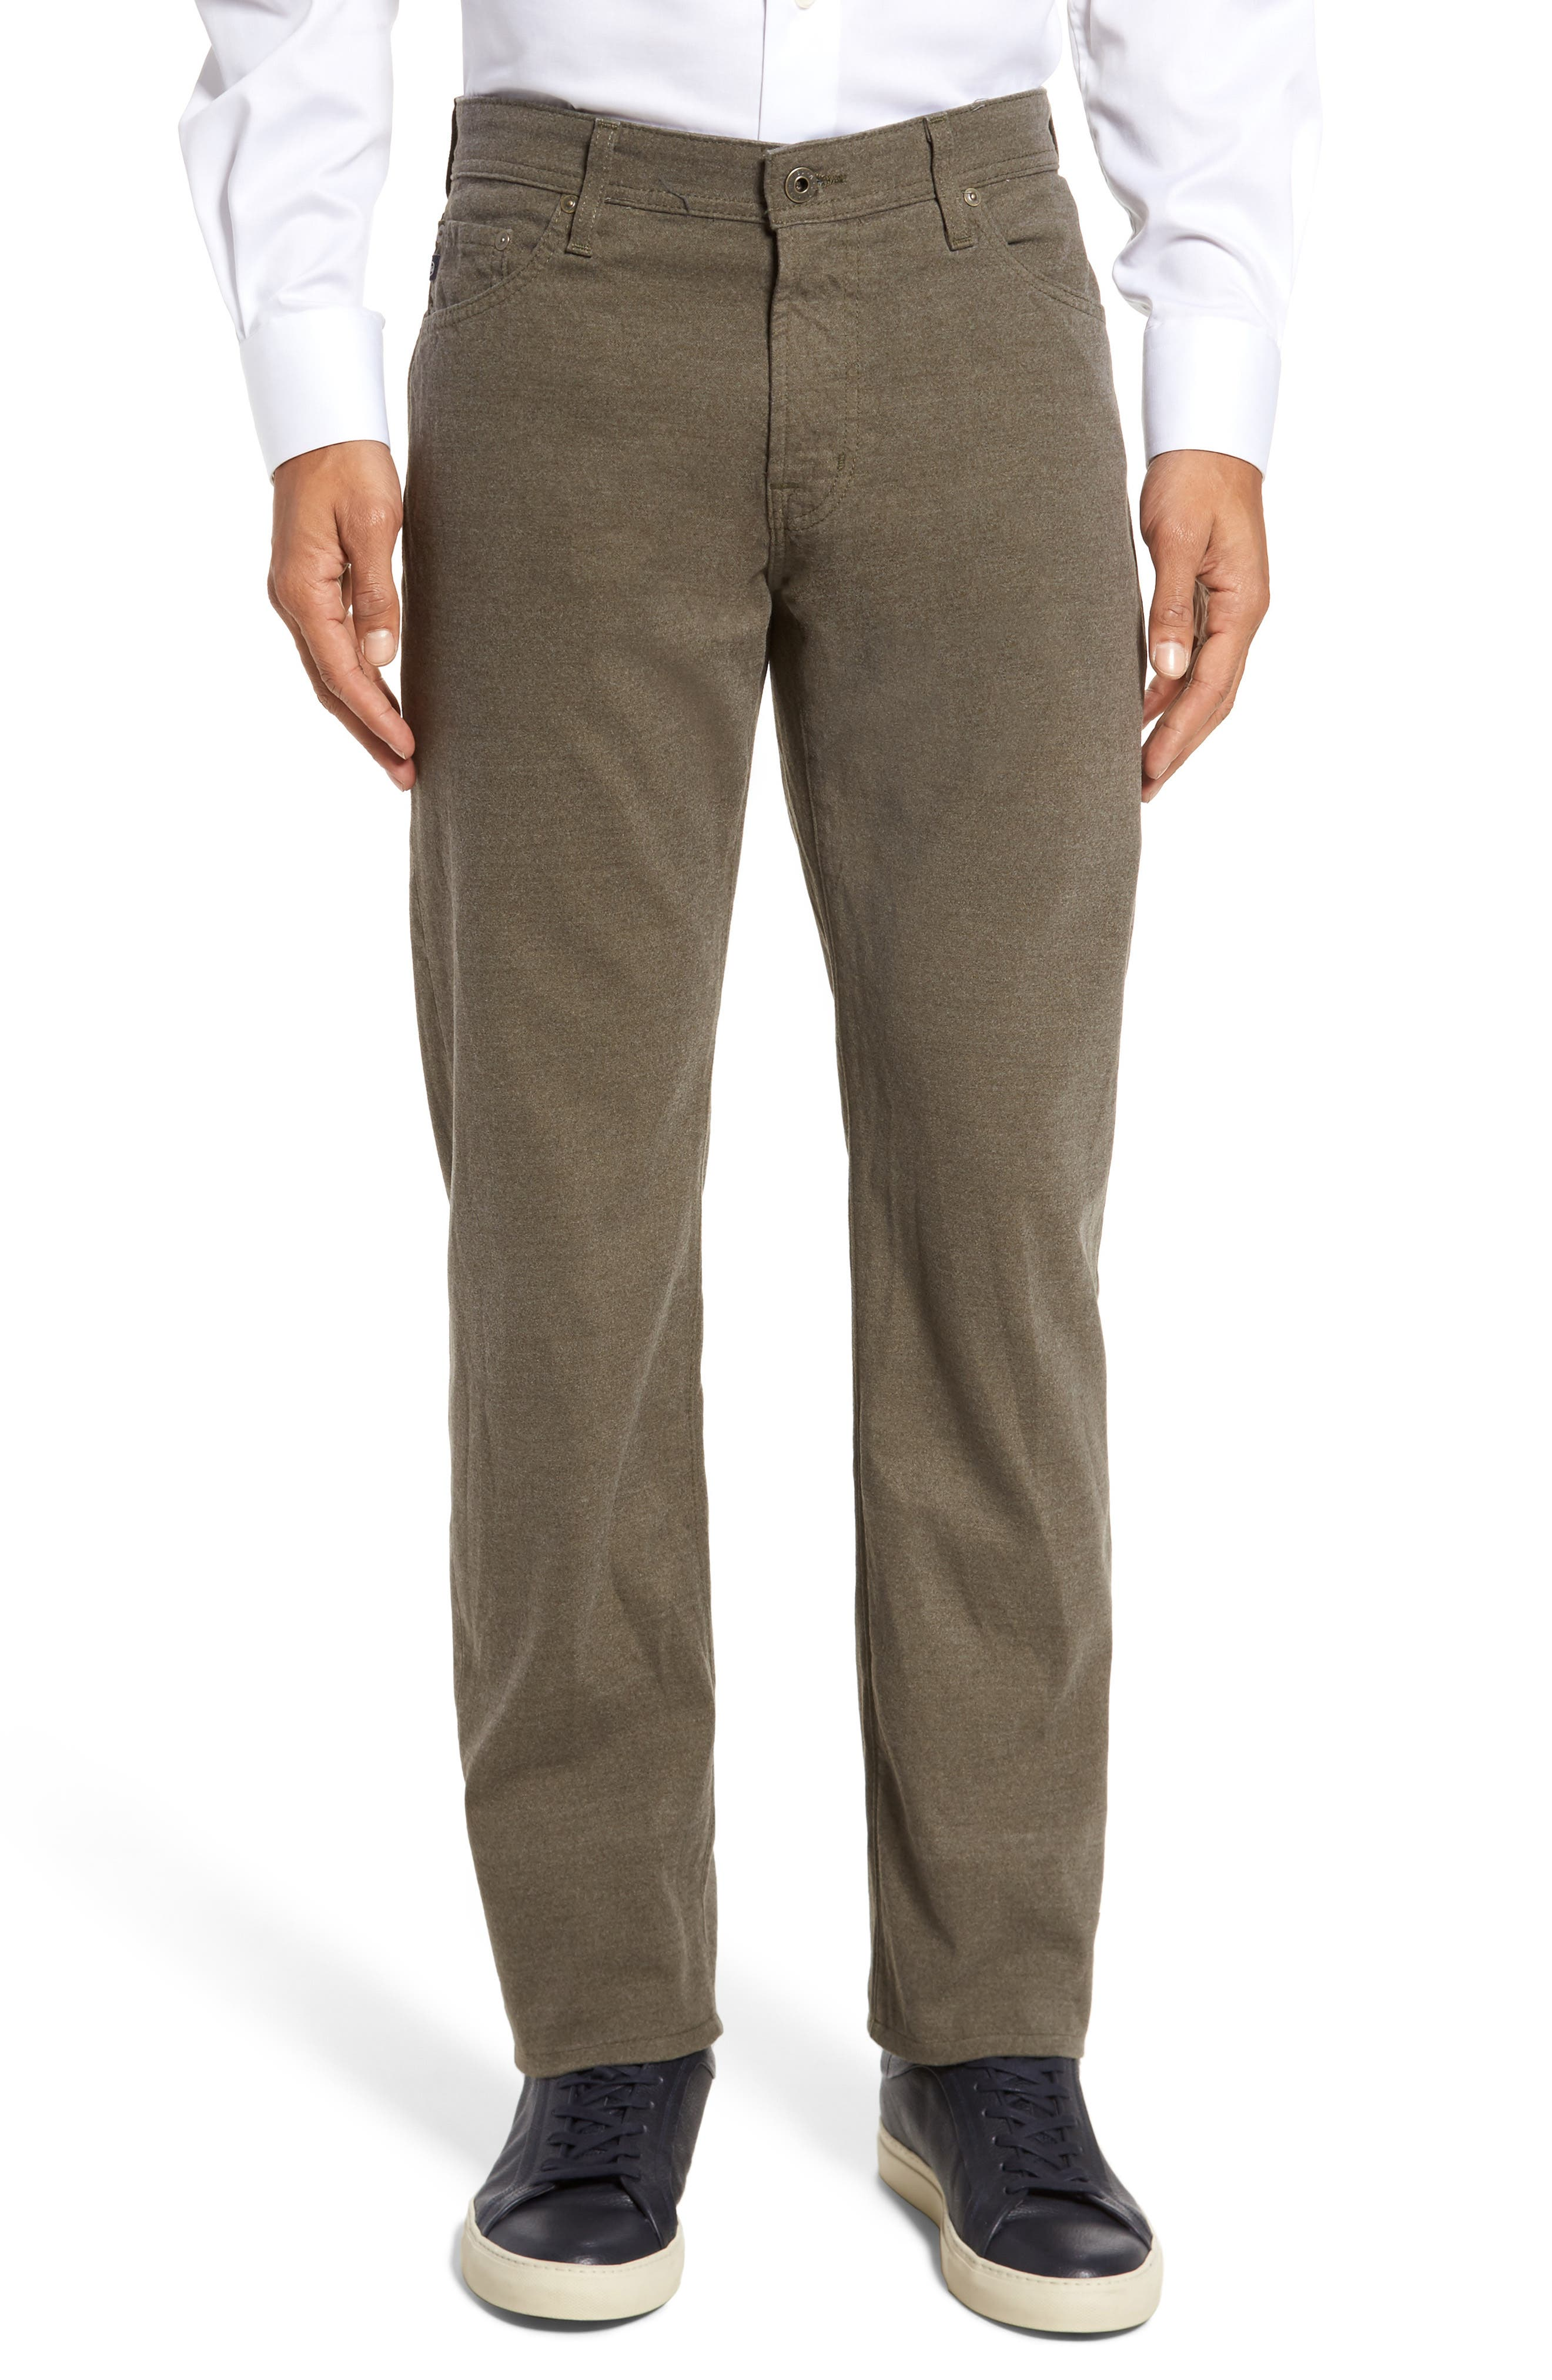 AG Graduate Tailored Five-Pocket Straight Leg Pants